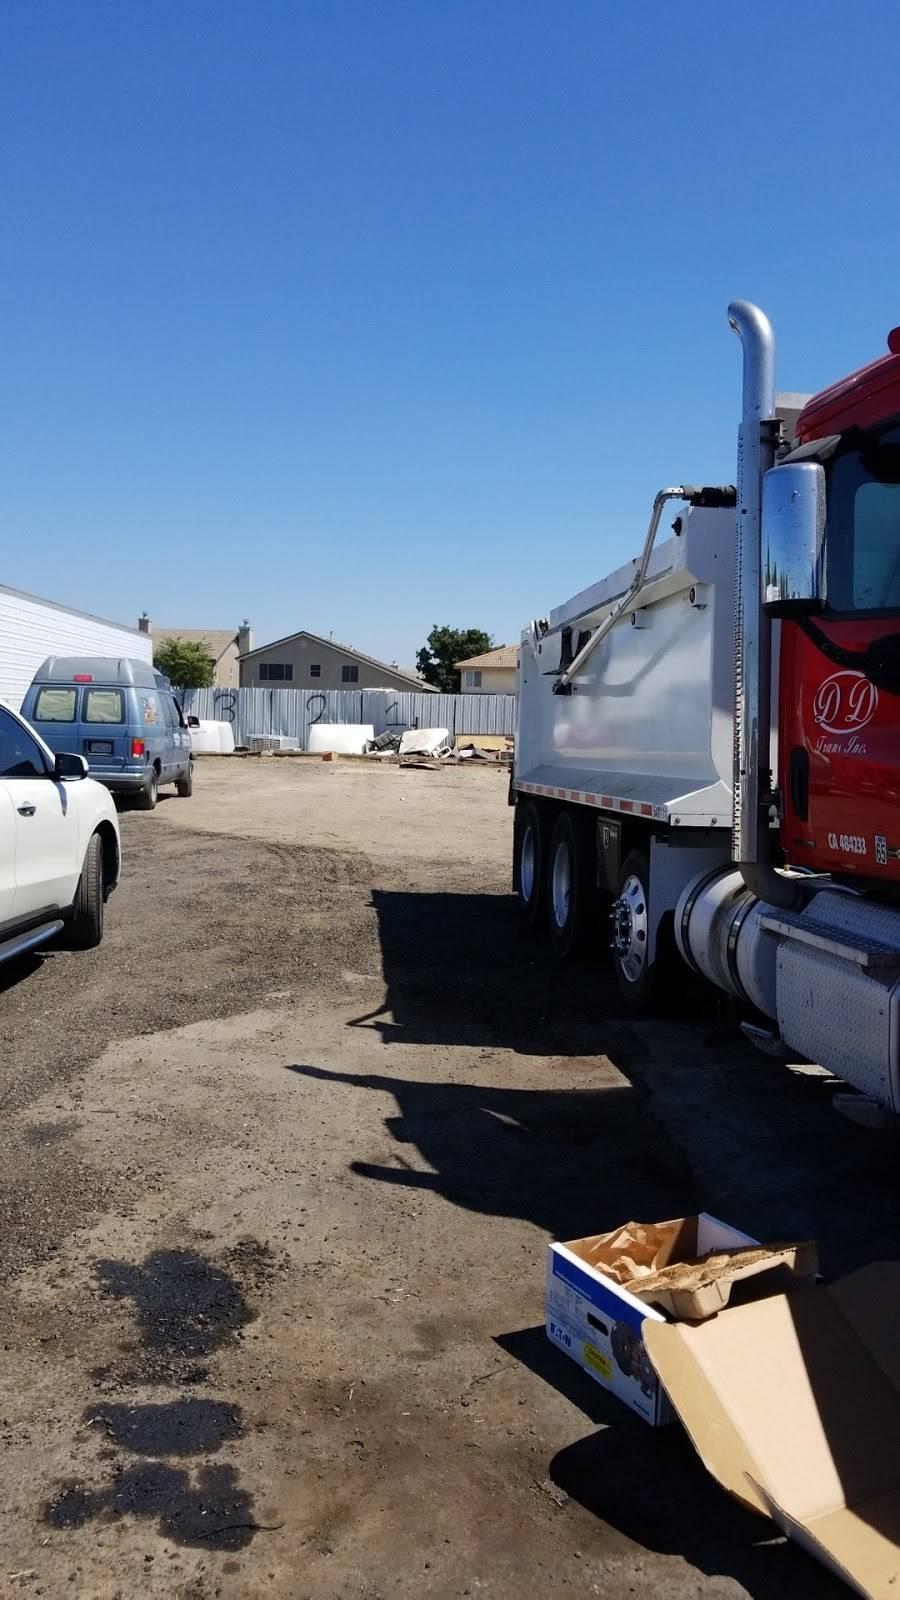 I5 Truck Trailer Repair - car repair  | Photo 1 of 5 | Address: Lathrop, CA 95330, USA | Phone: (510) 589-3811